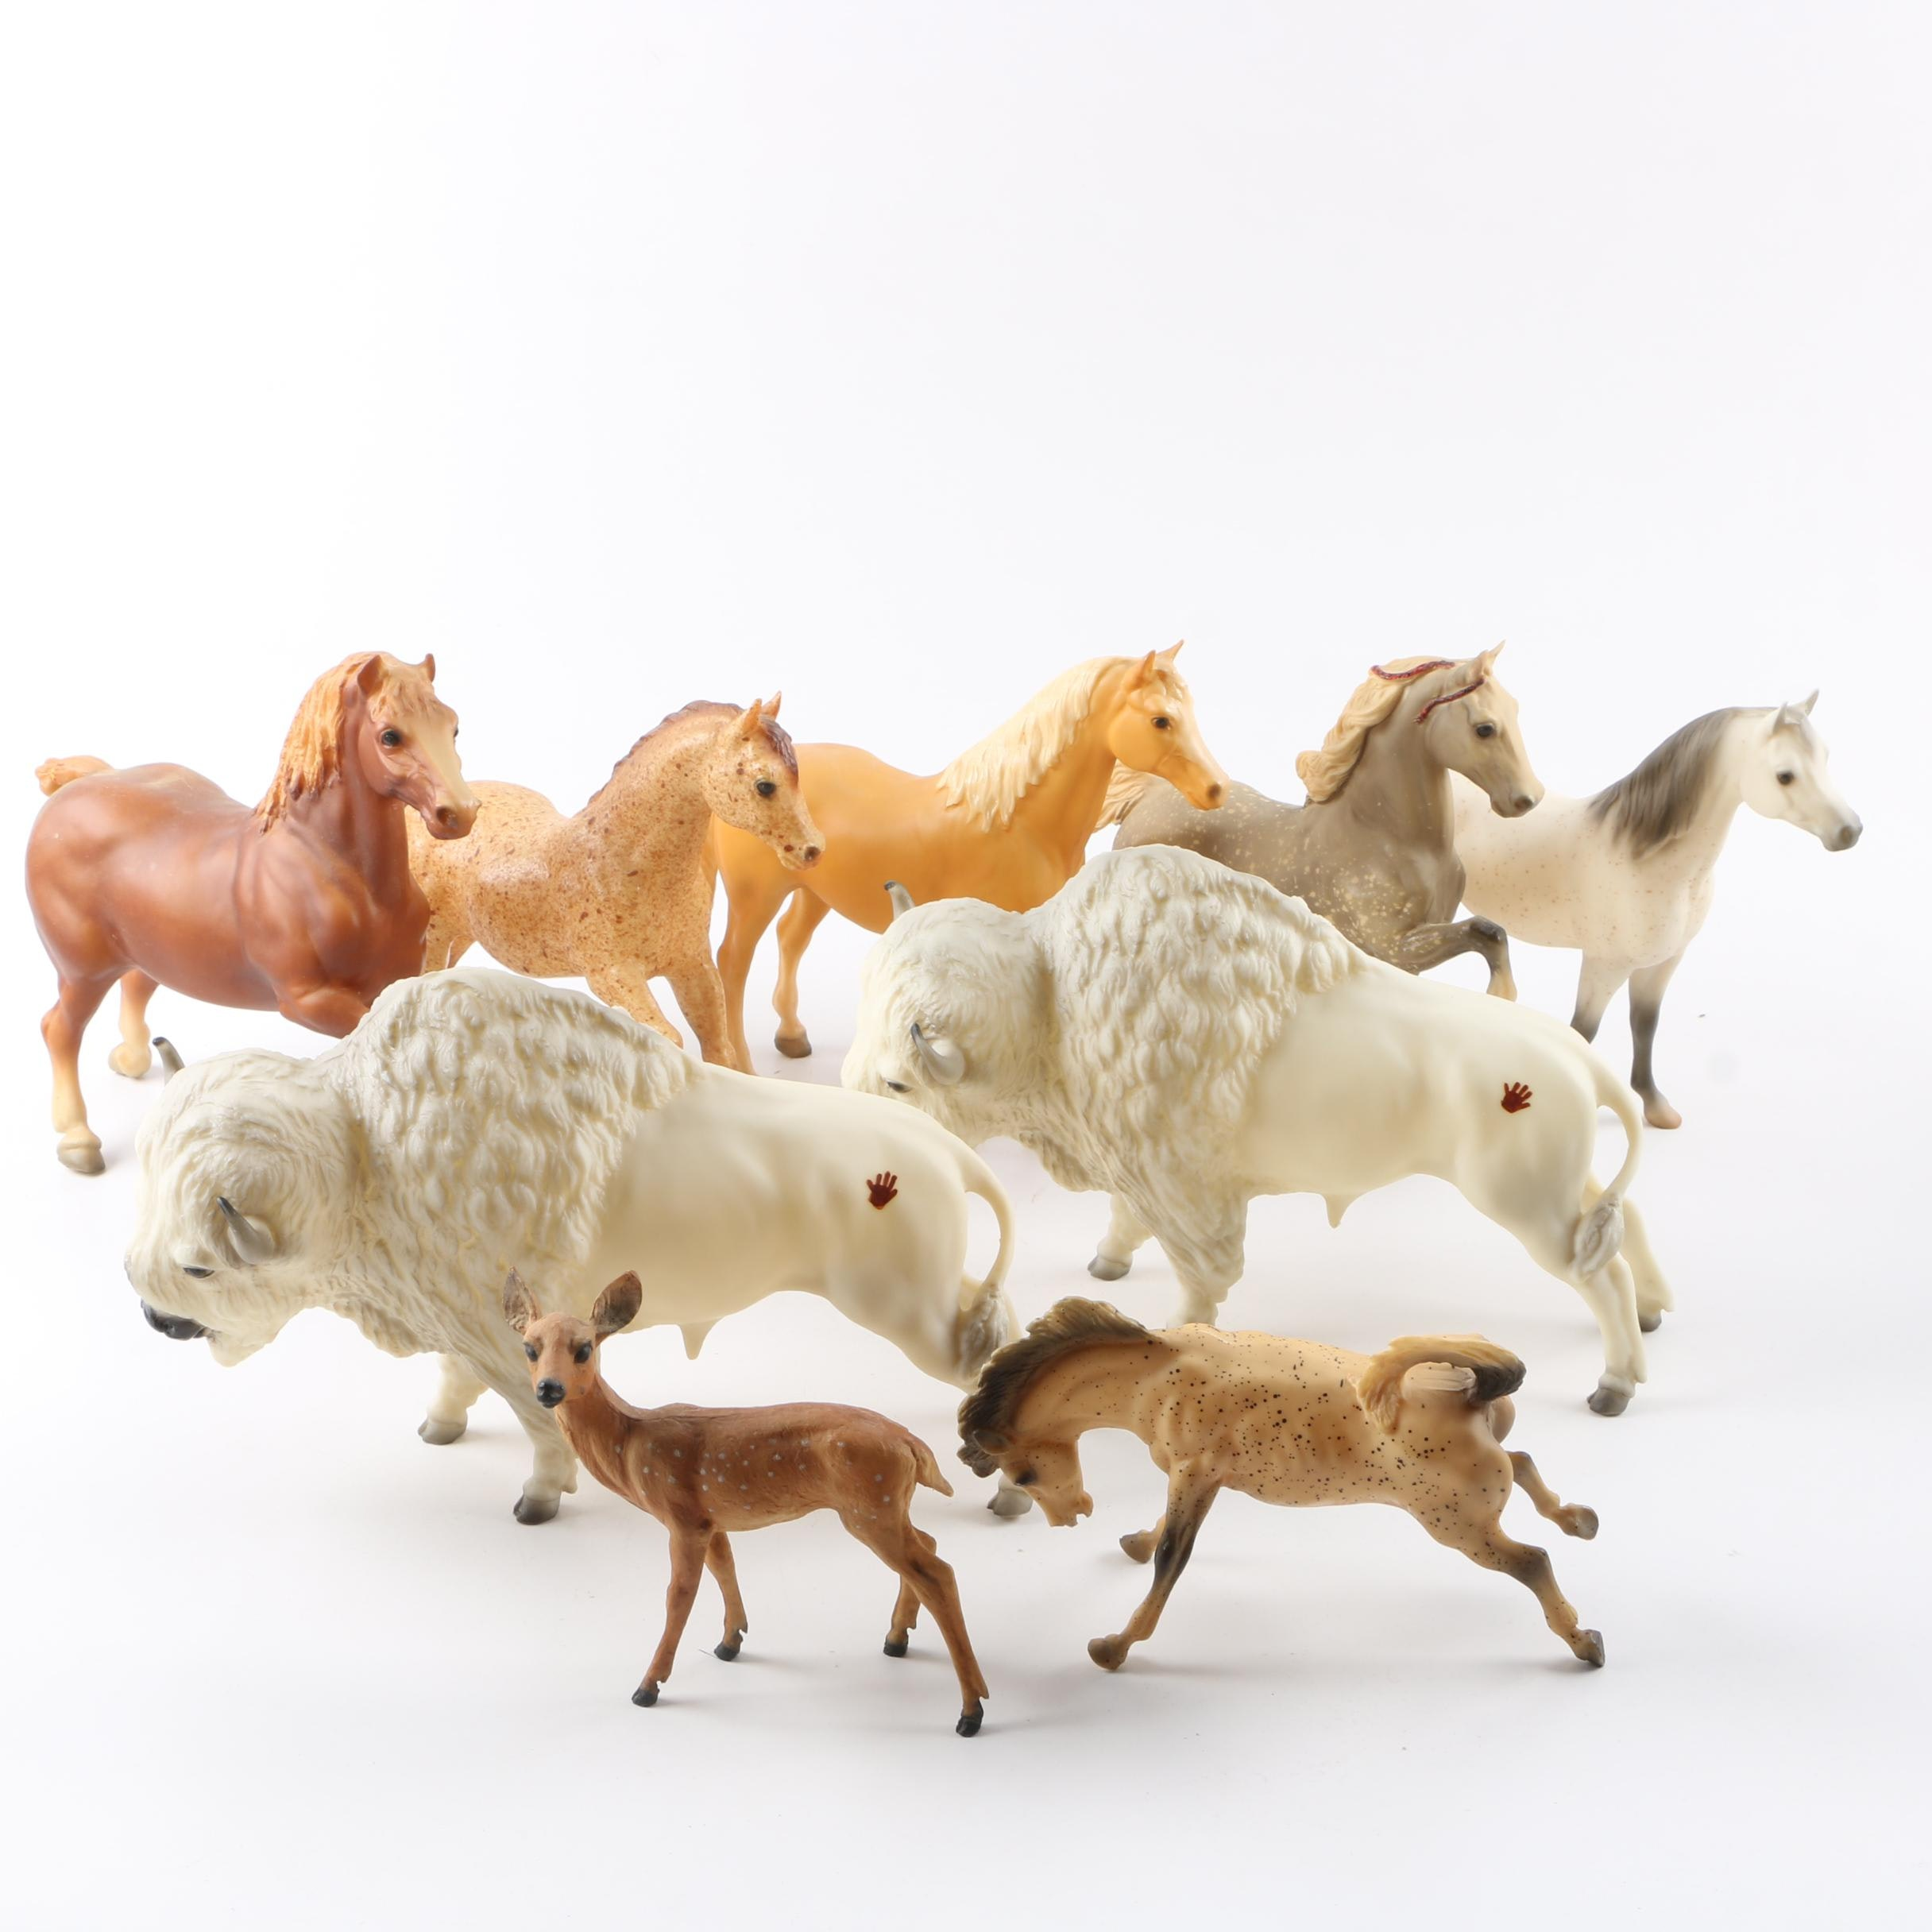 Variety of Animal Figurines